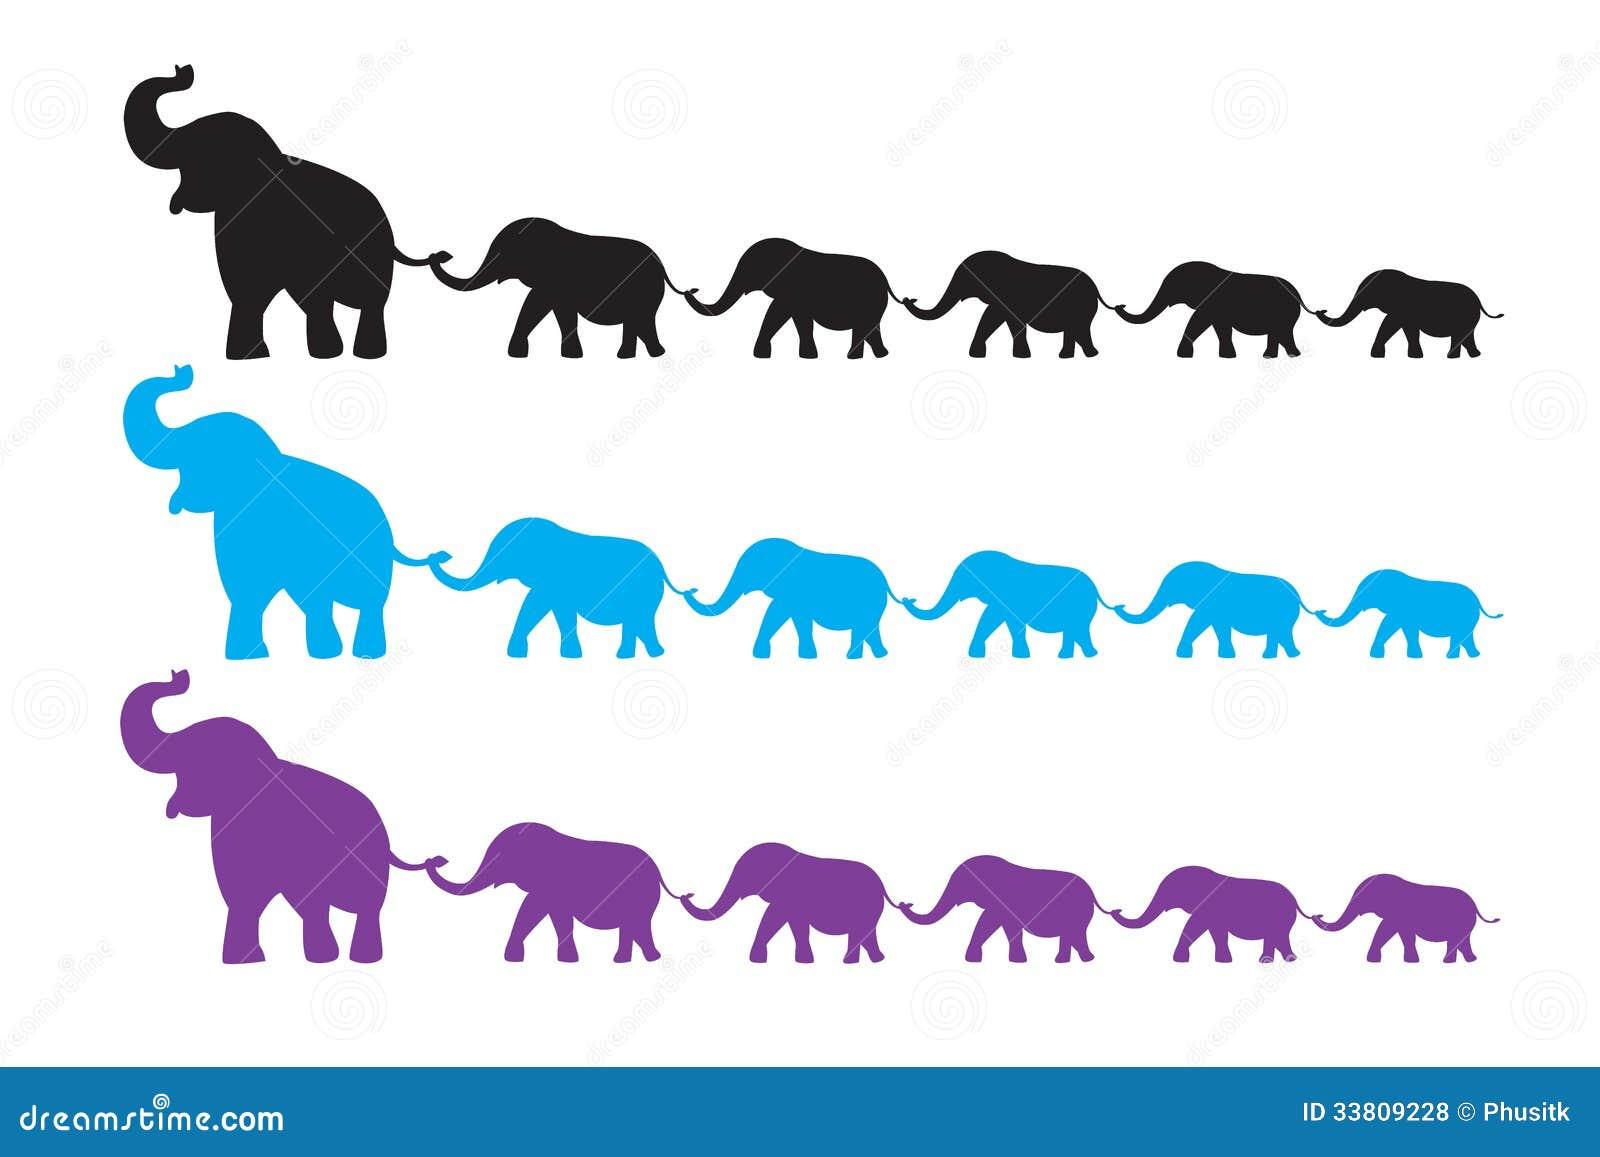 Elephant Family Walk Royalty Free Stock Photos - Image: 33809228